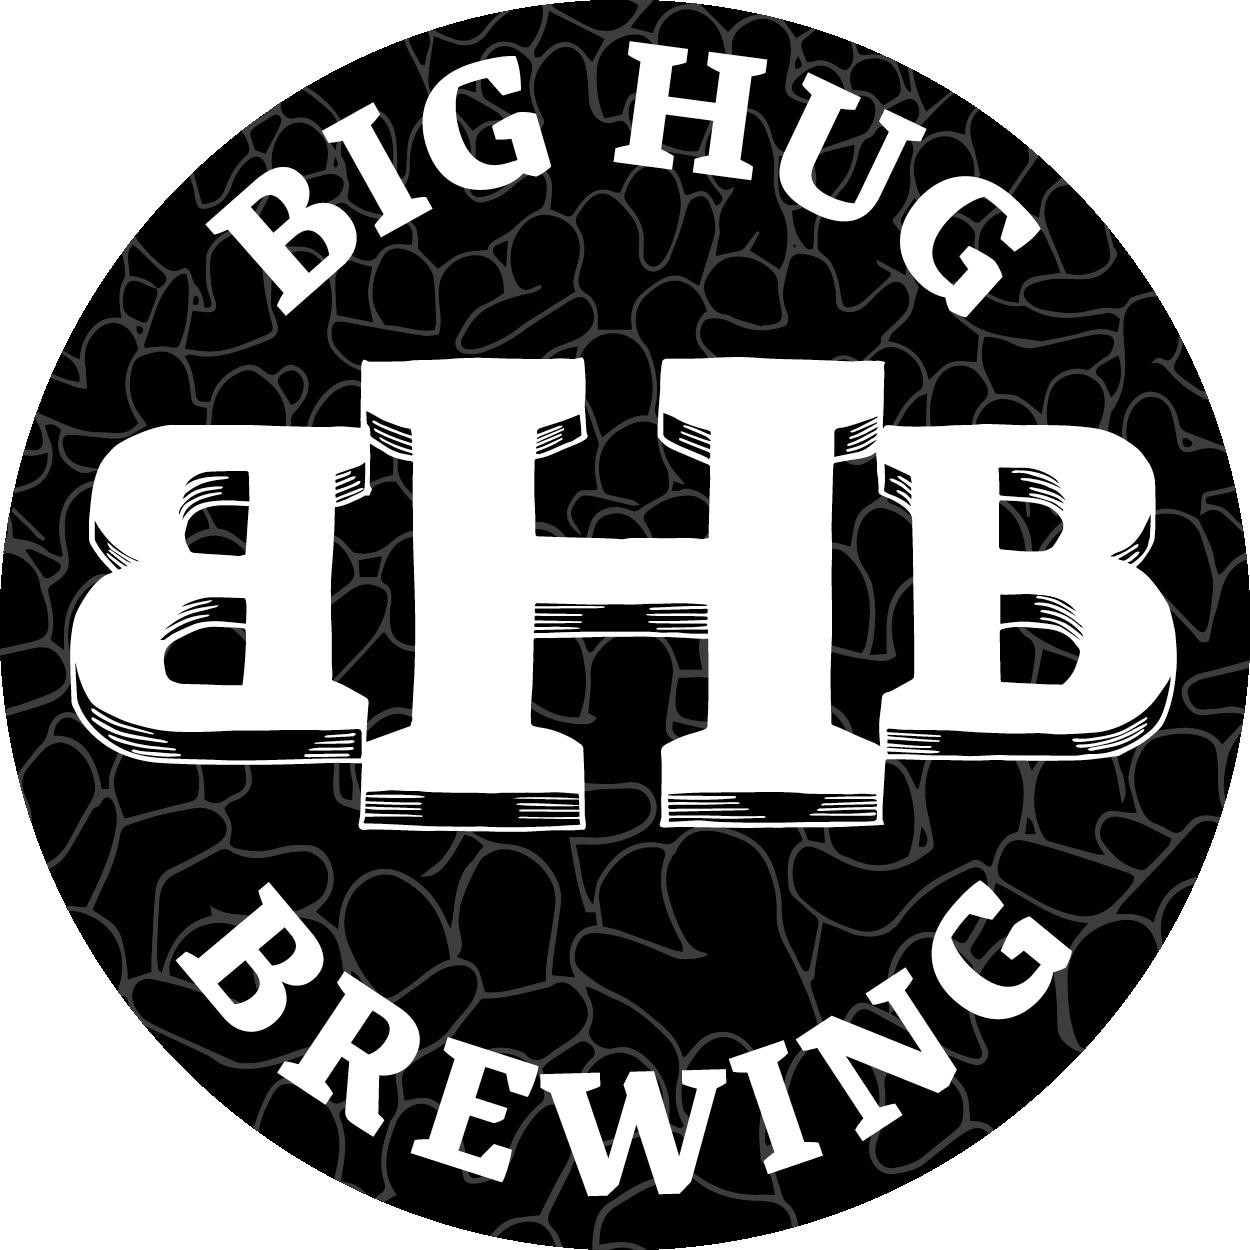 Big hug brewing Logo black